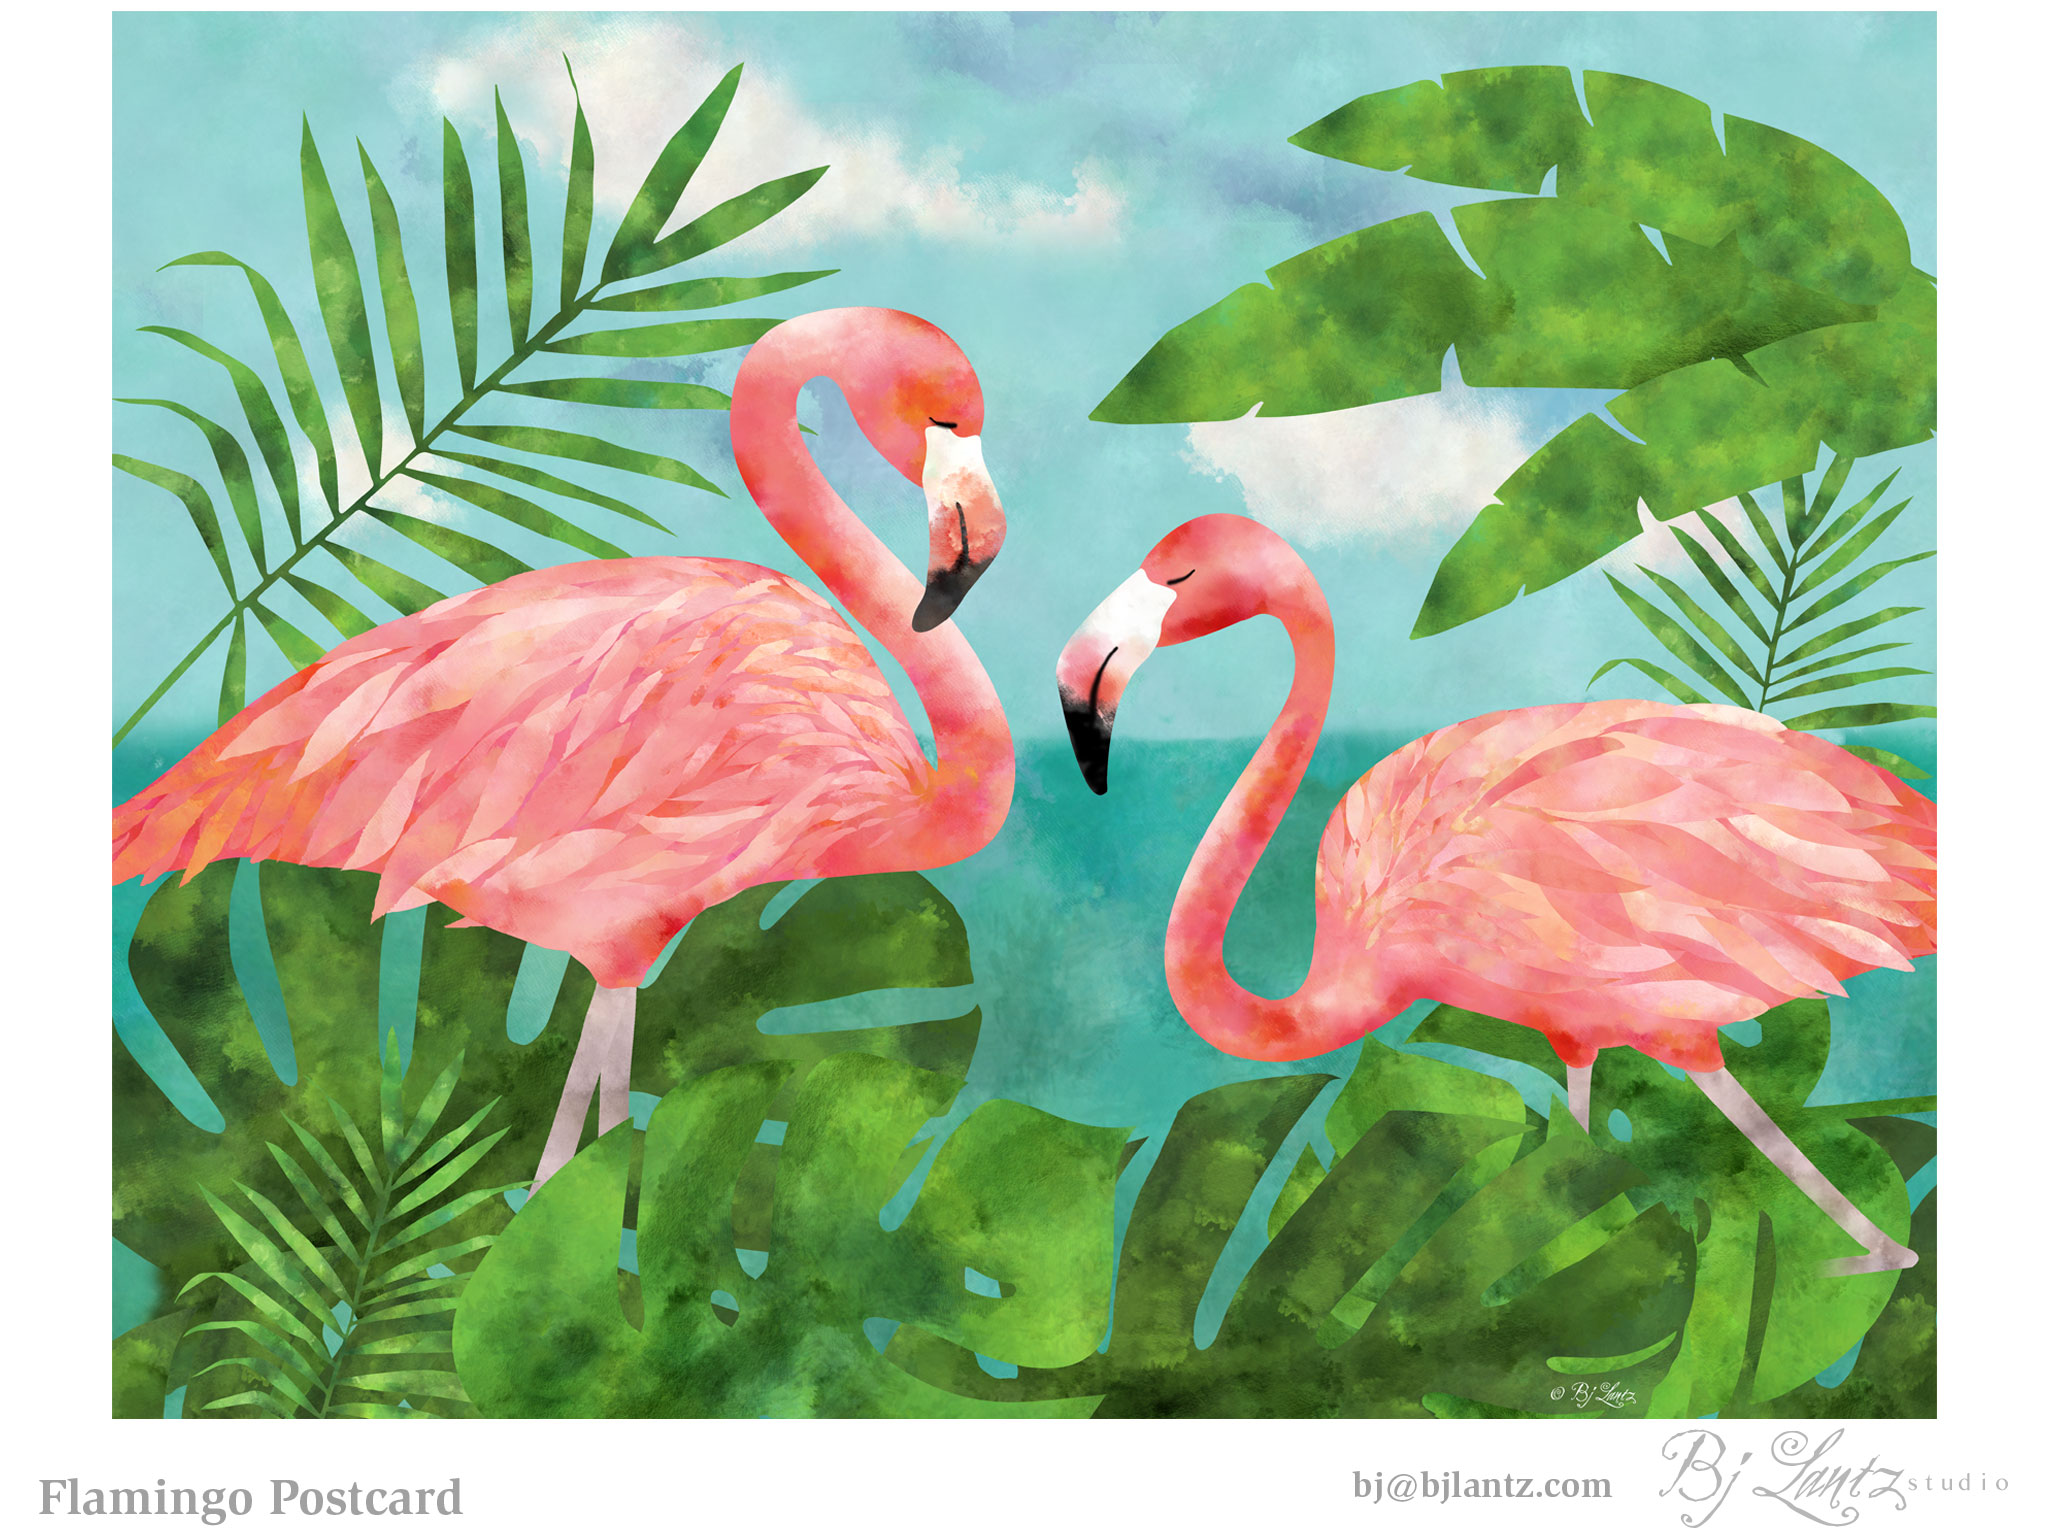 FlamingoPostcard-1_portfolio_Lantz.jpg